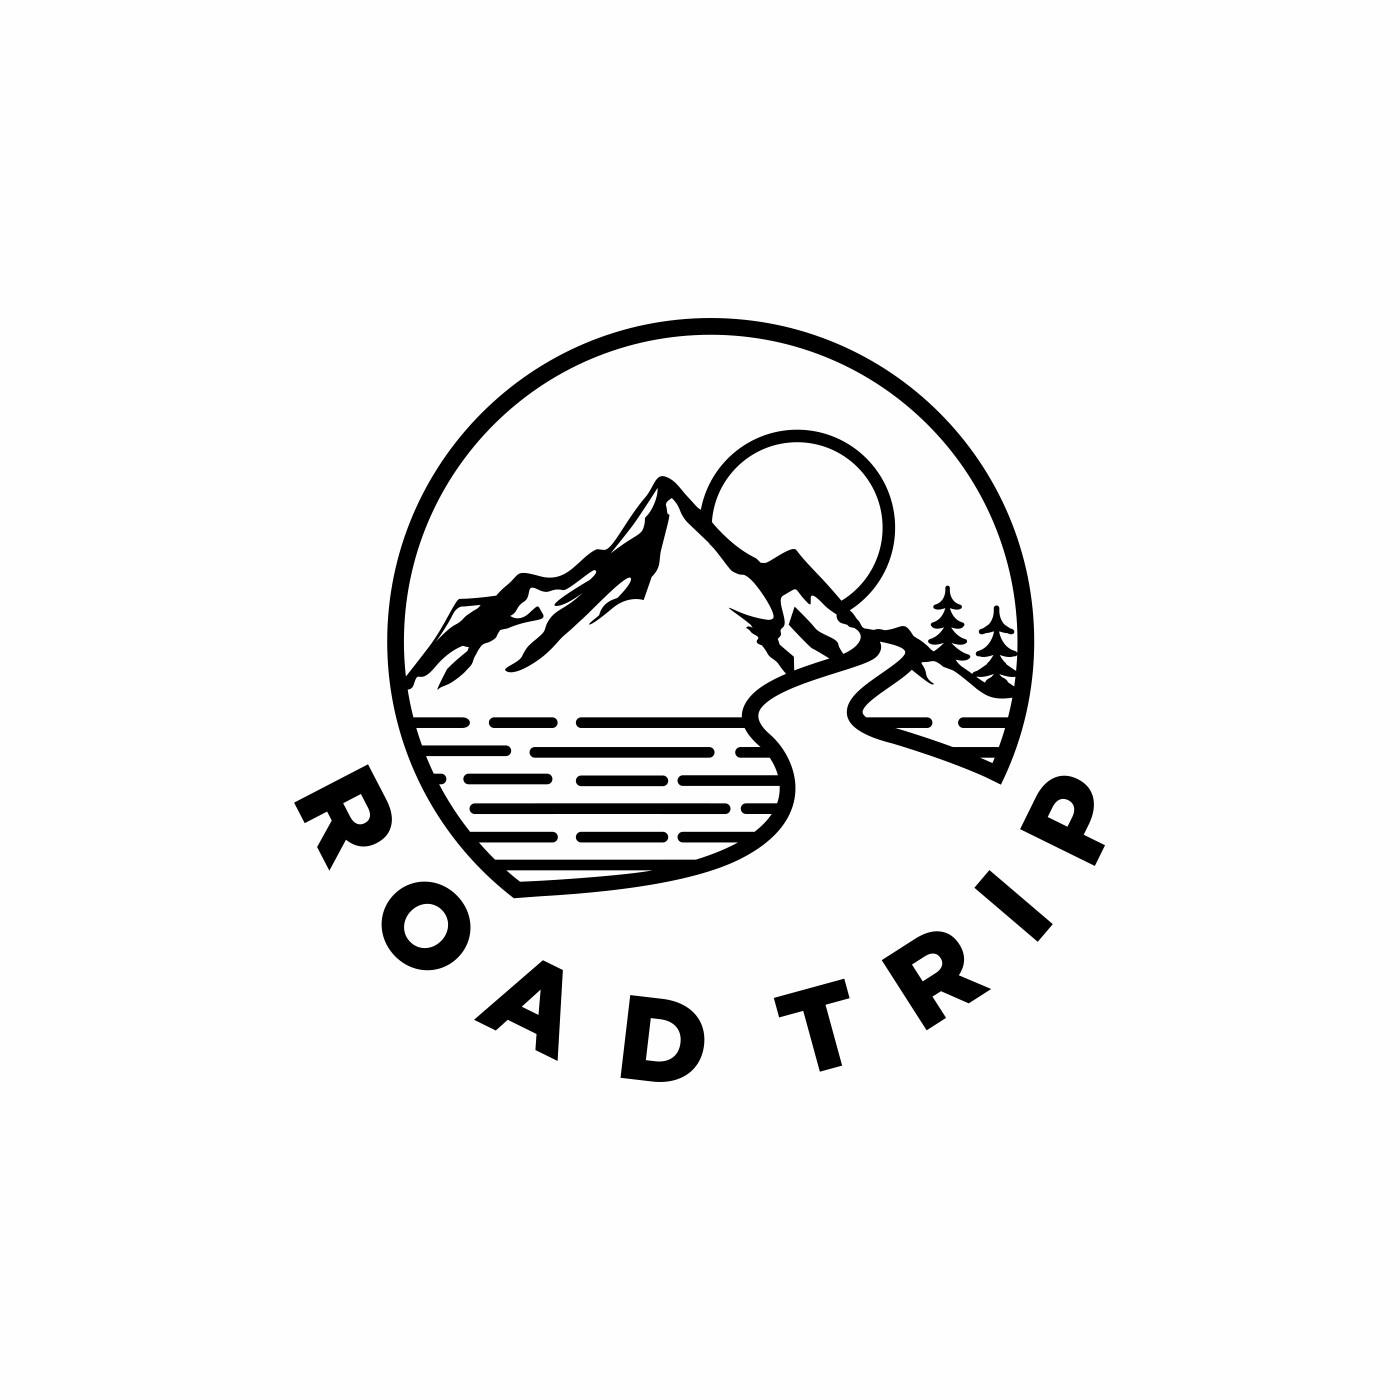 We need a sharp skateboard, longboard, and clothing logo design